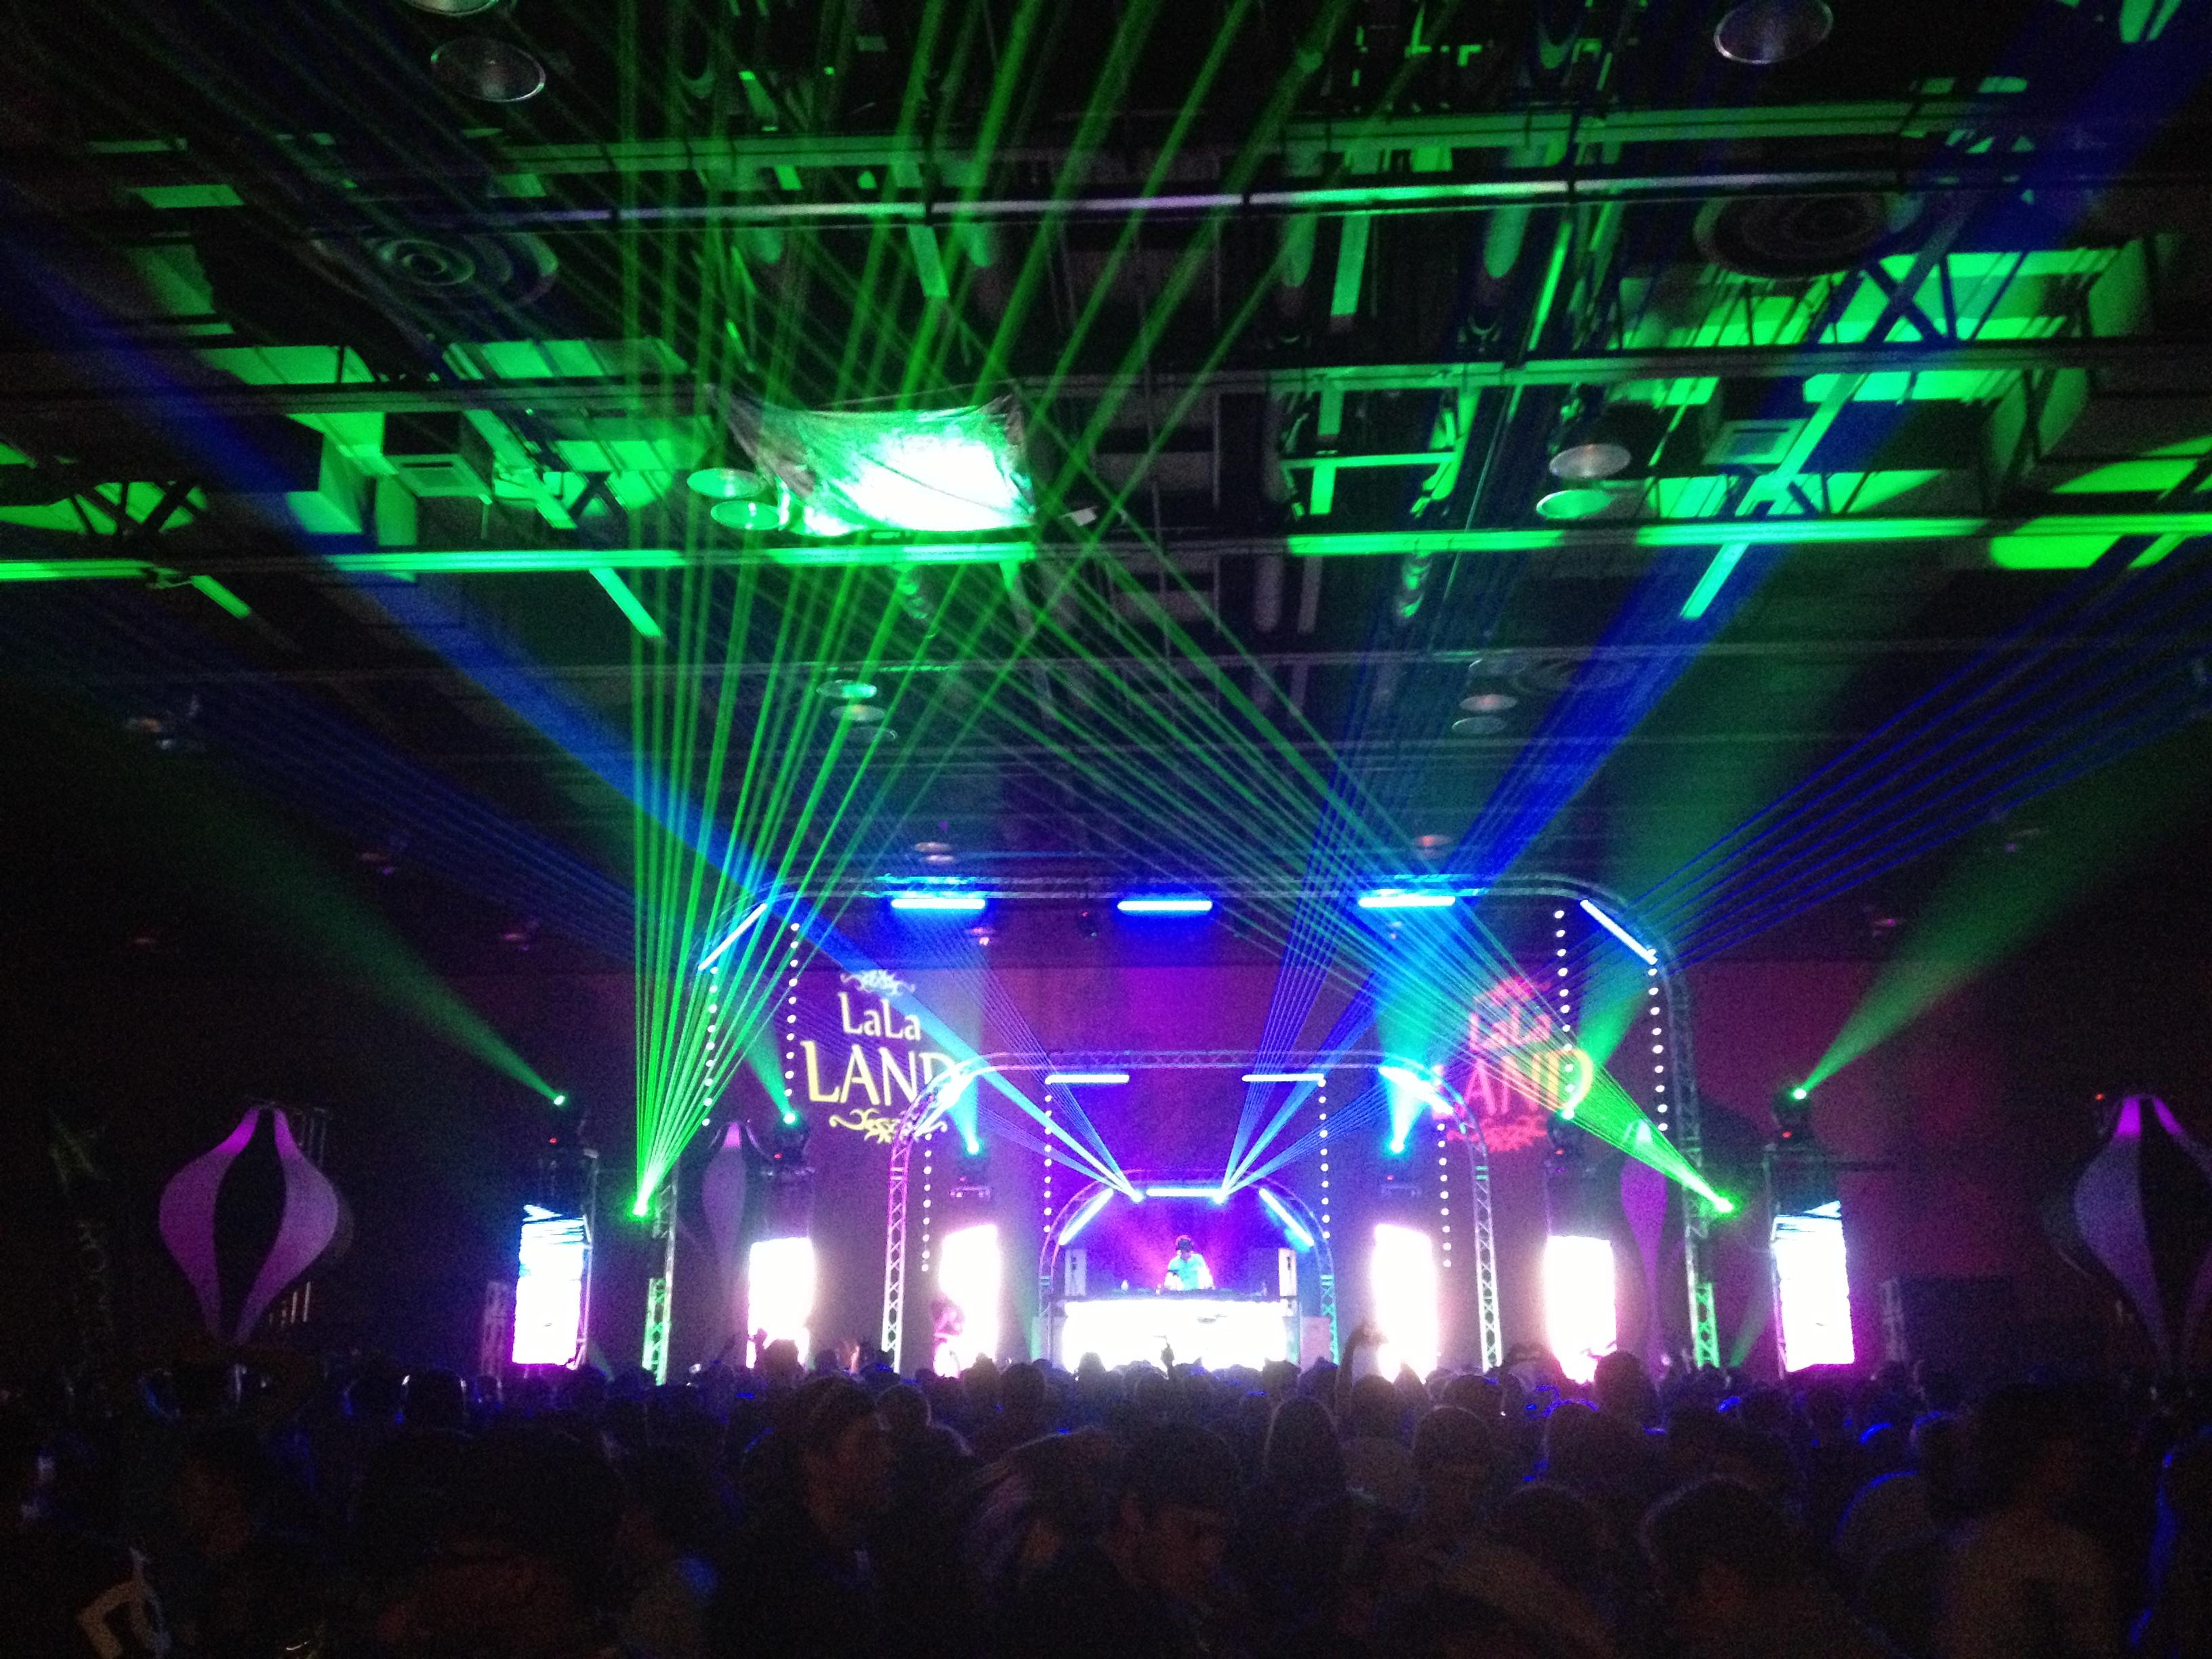 LALA LAND EDM EVENT